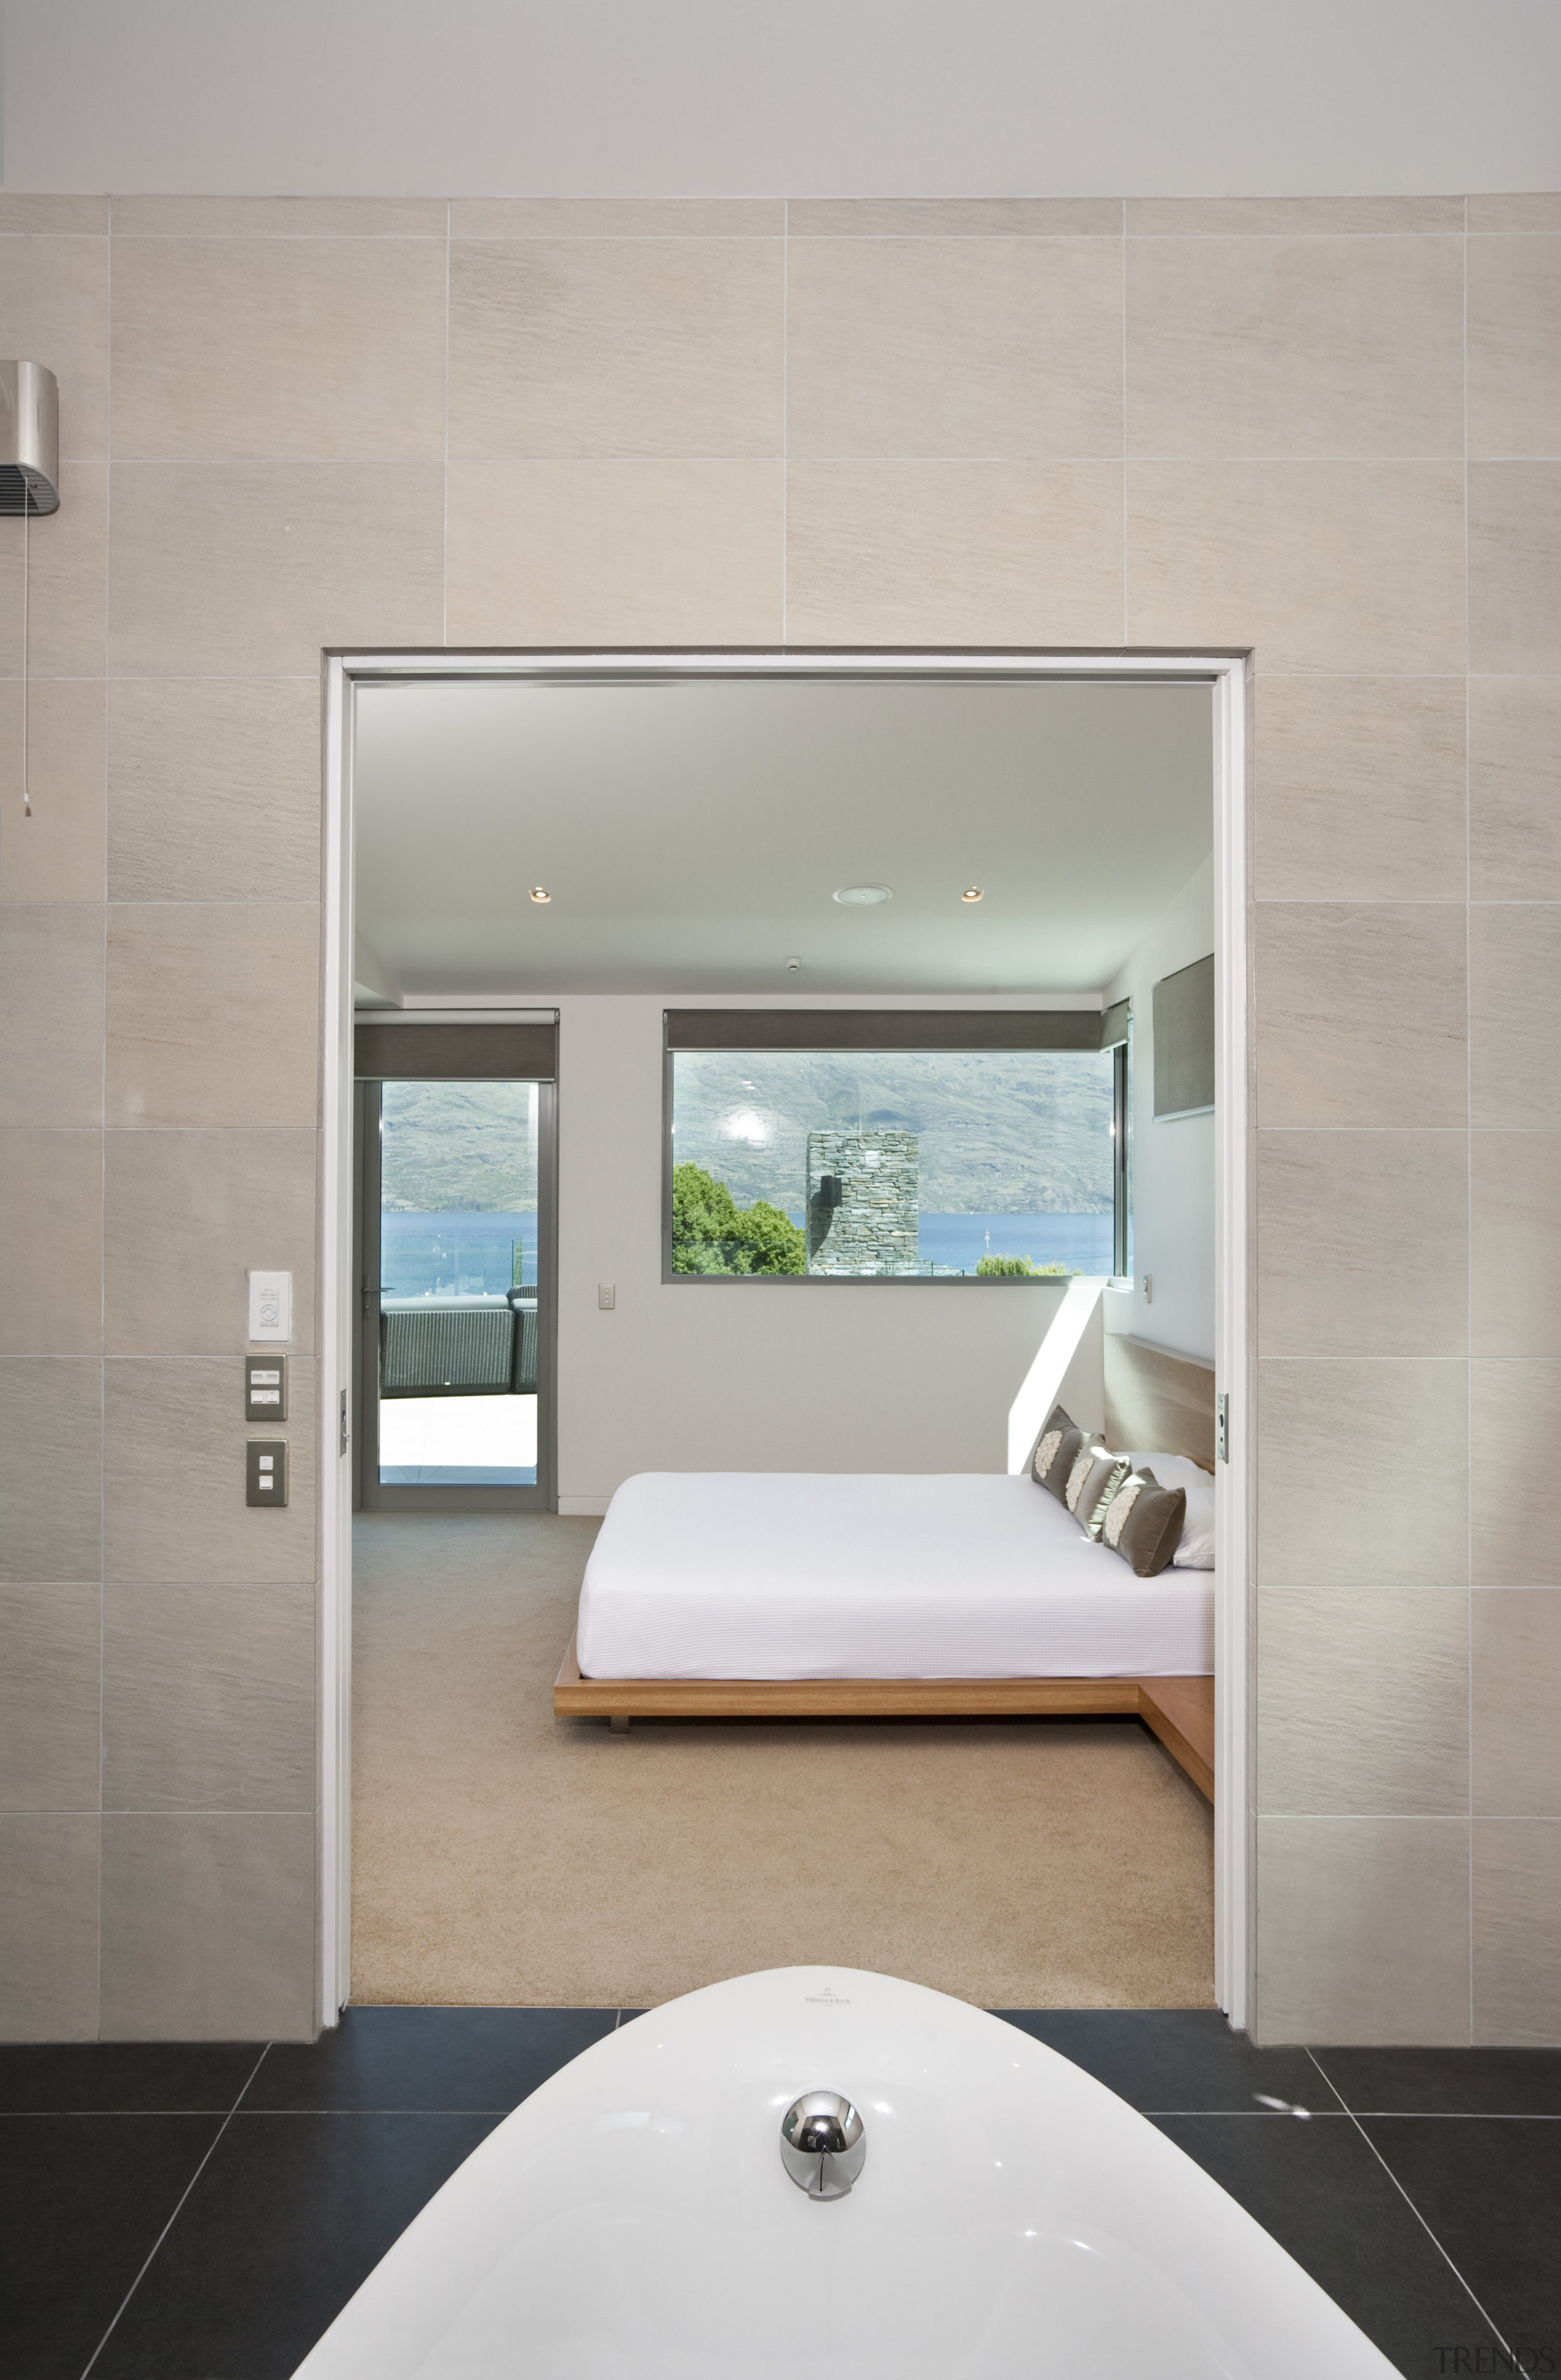 Interior view of this contemporary bathroom - Interior architecture, bathroom, floor, house, interior design, room, gray